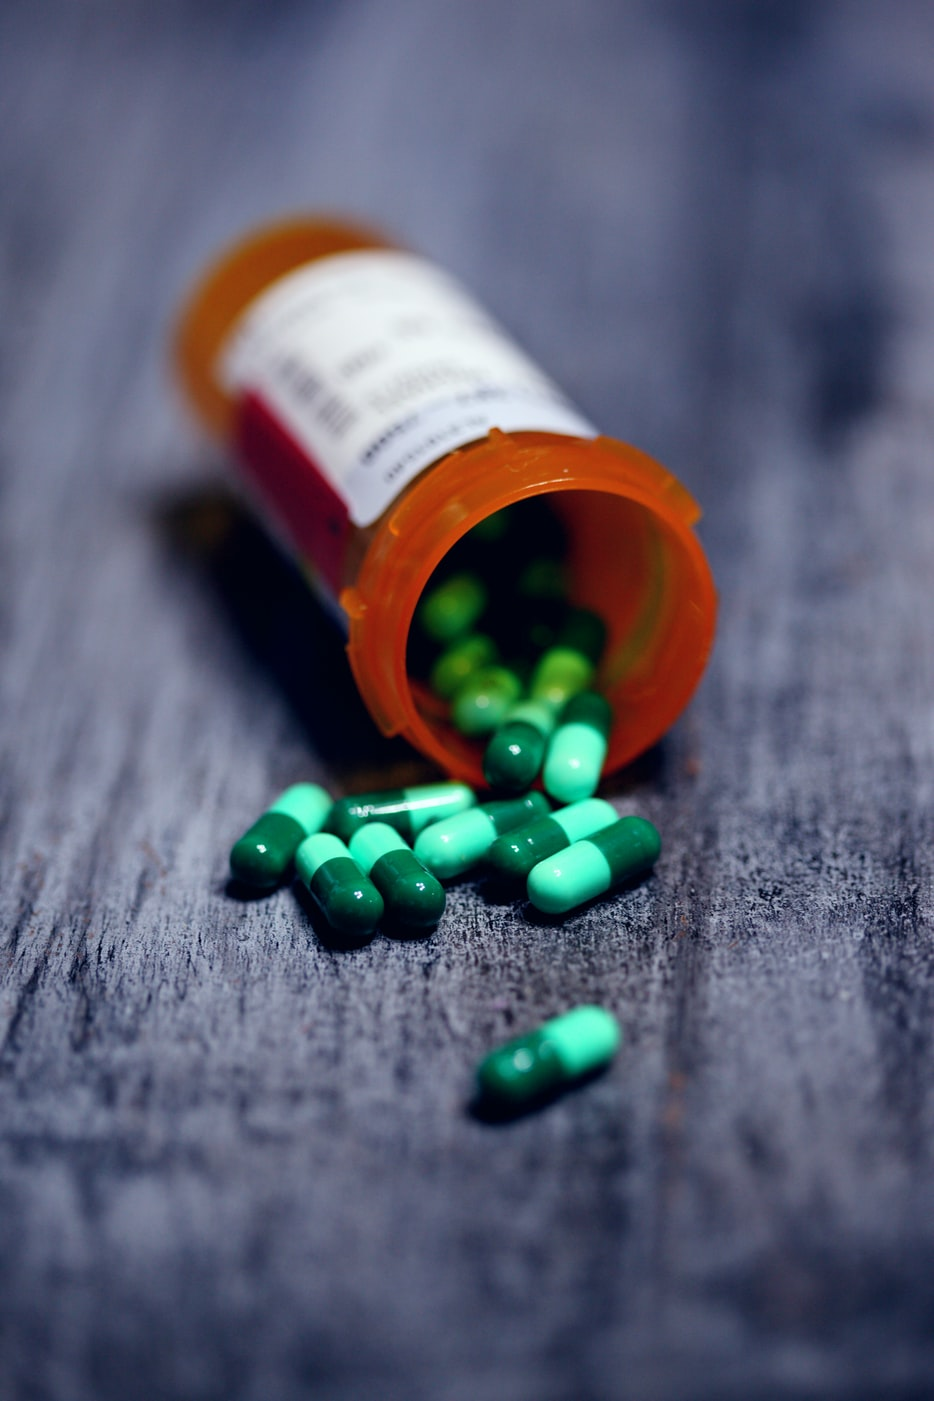 treatment for opioid addiction